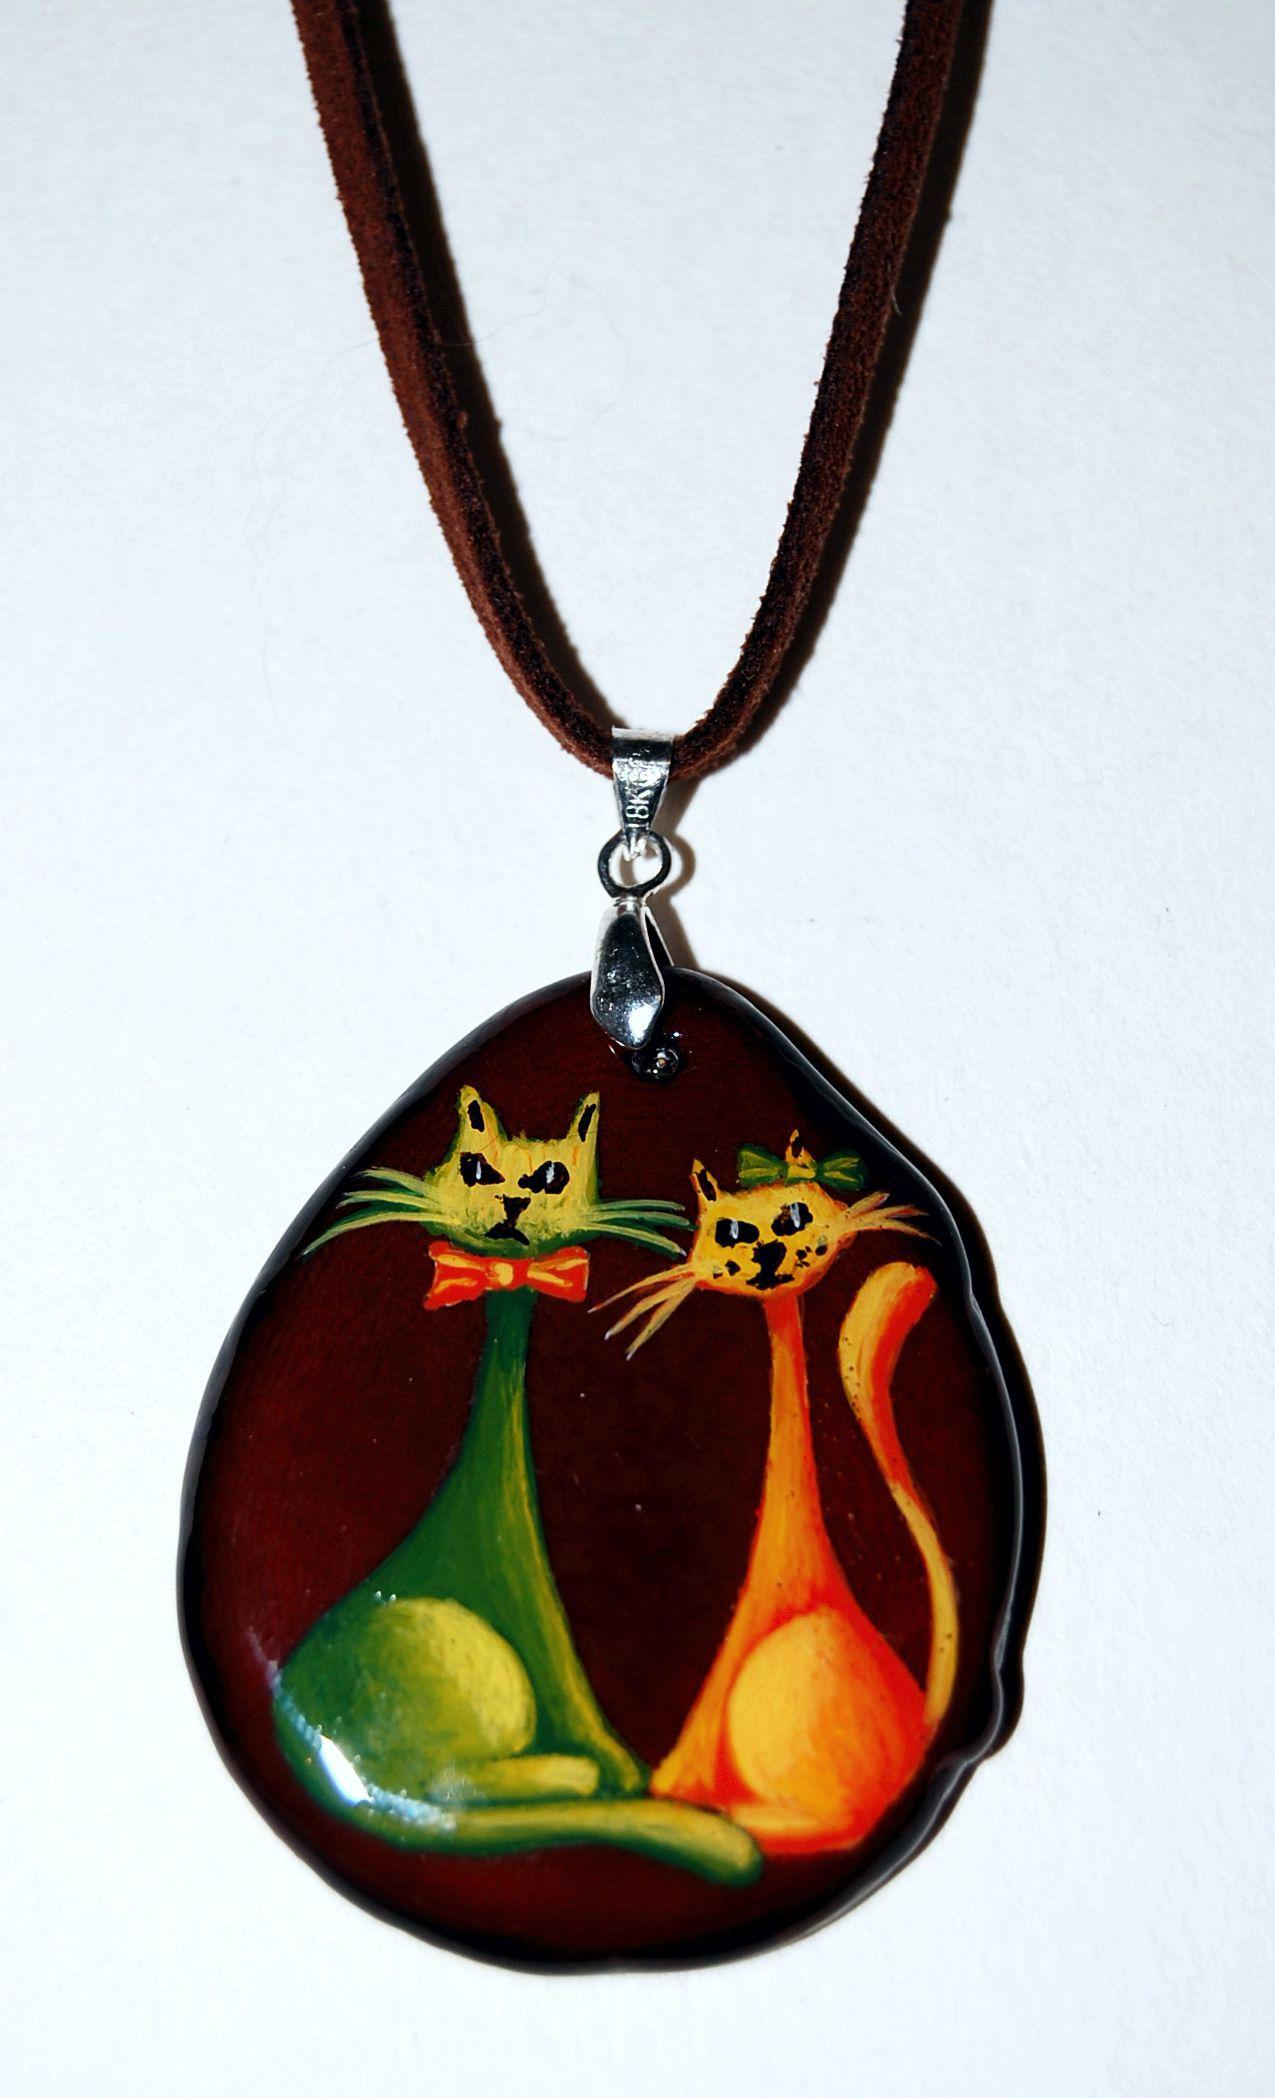 Centro gato verde y naranja